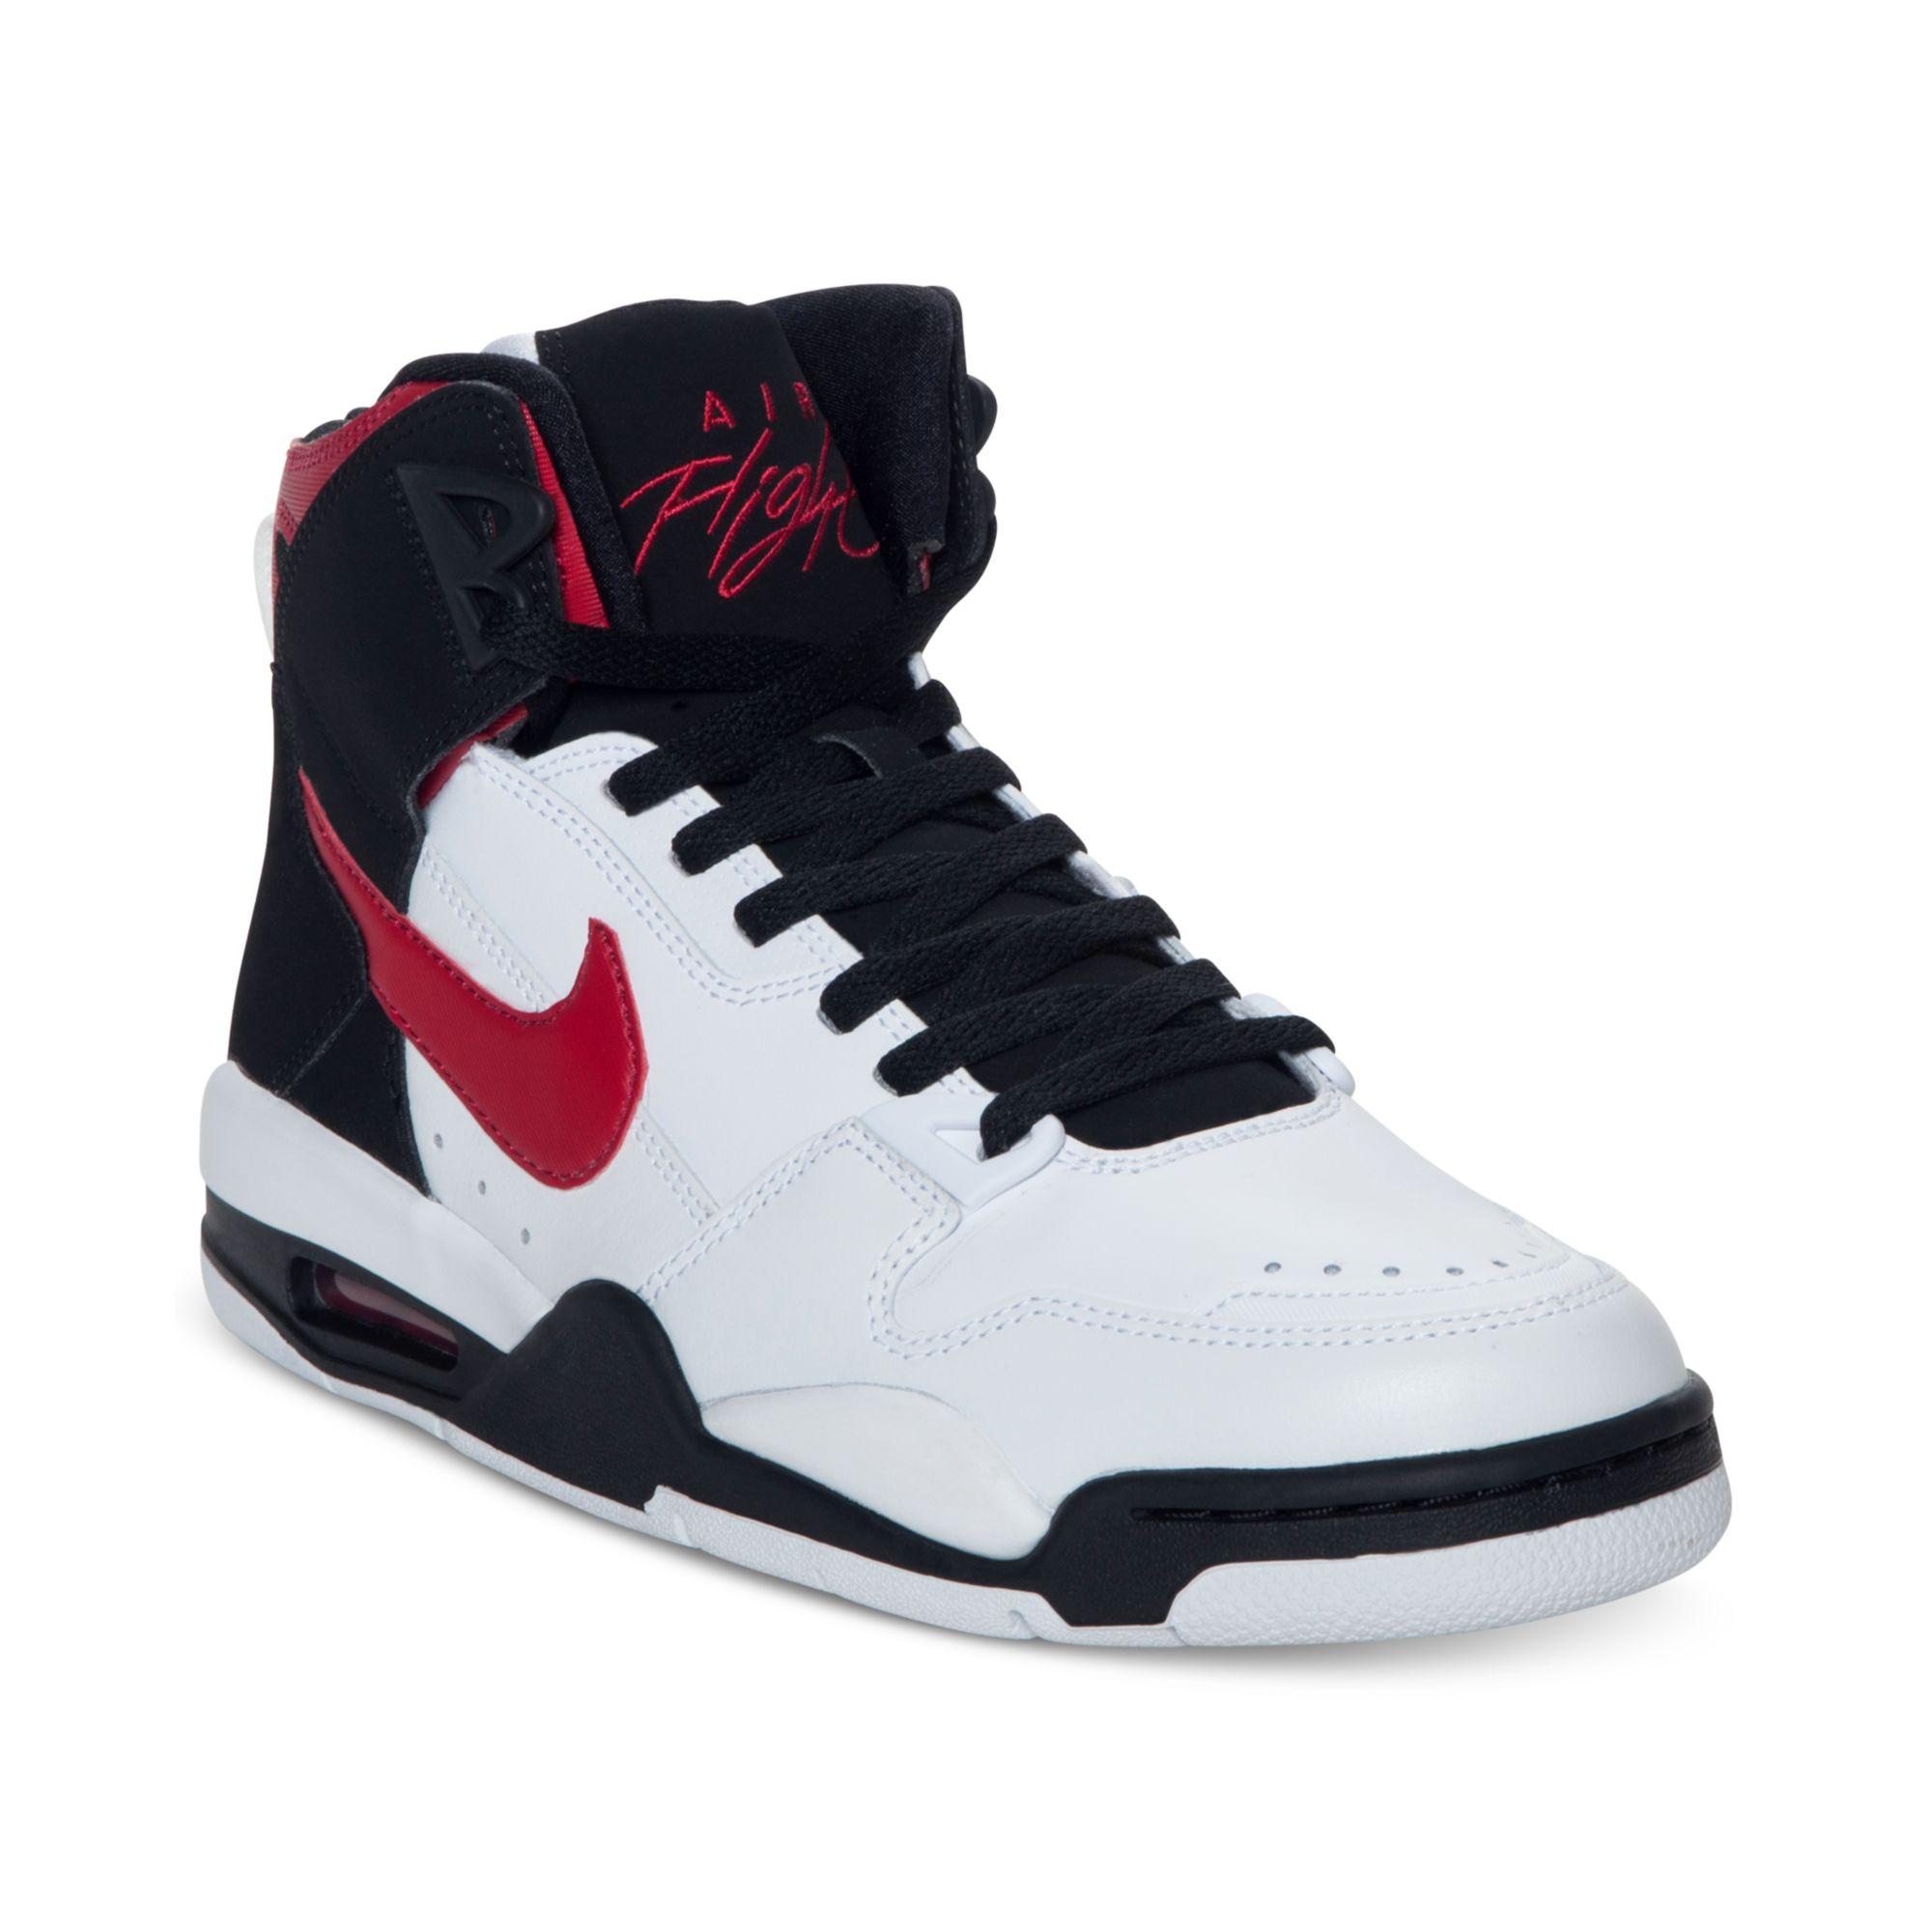 Nike Flight Condor High Si Basketball